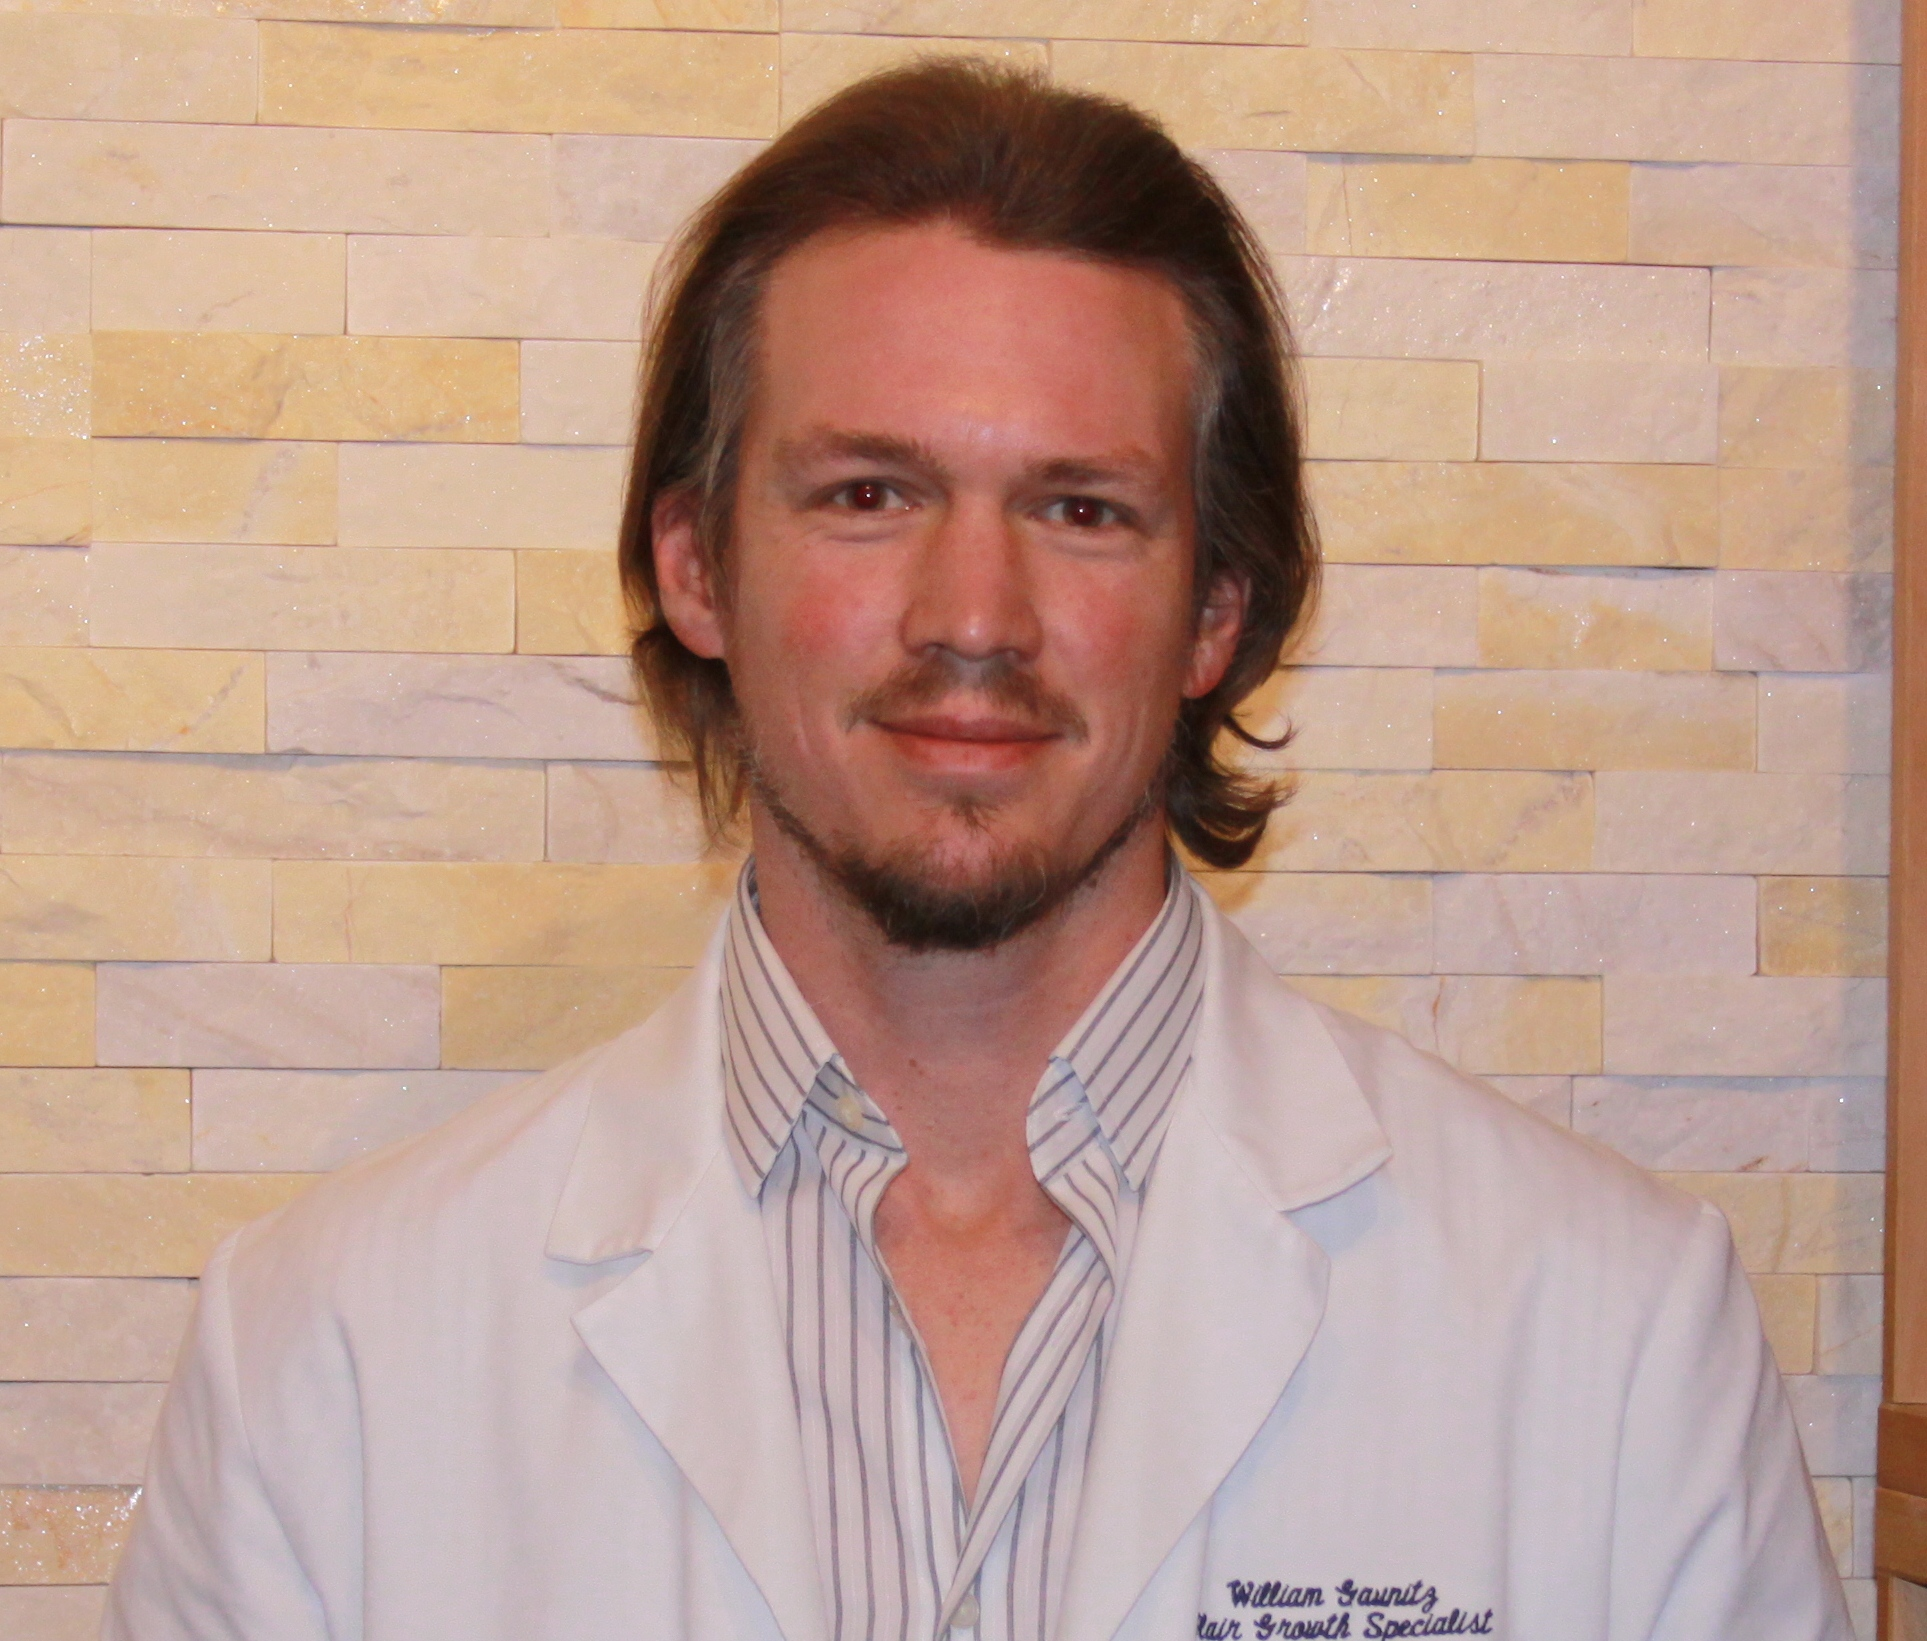 William Gaunitz trichologisto head shot